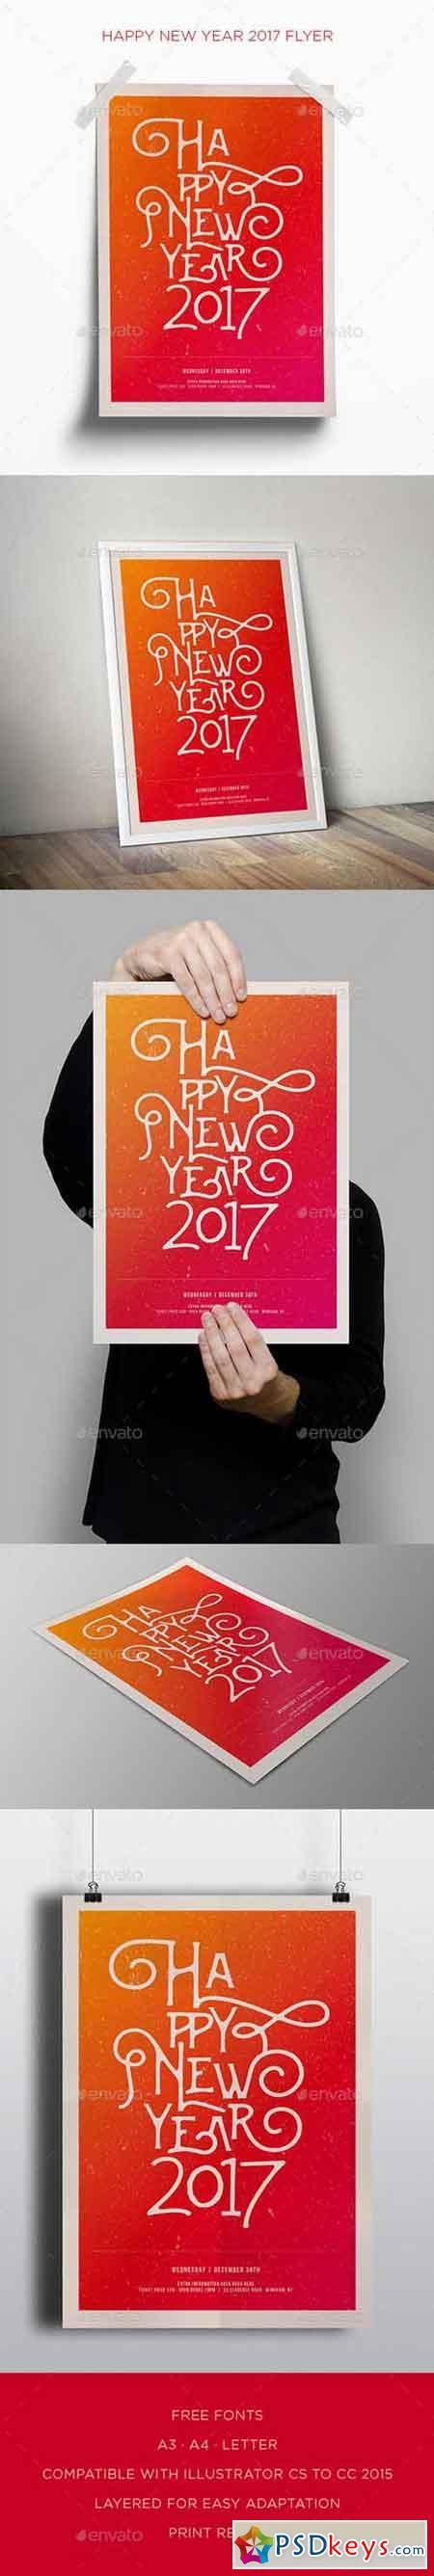 Happy New Year 2017 Flyer 18255867